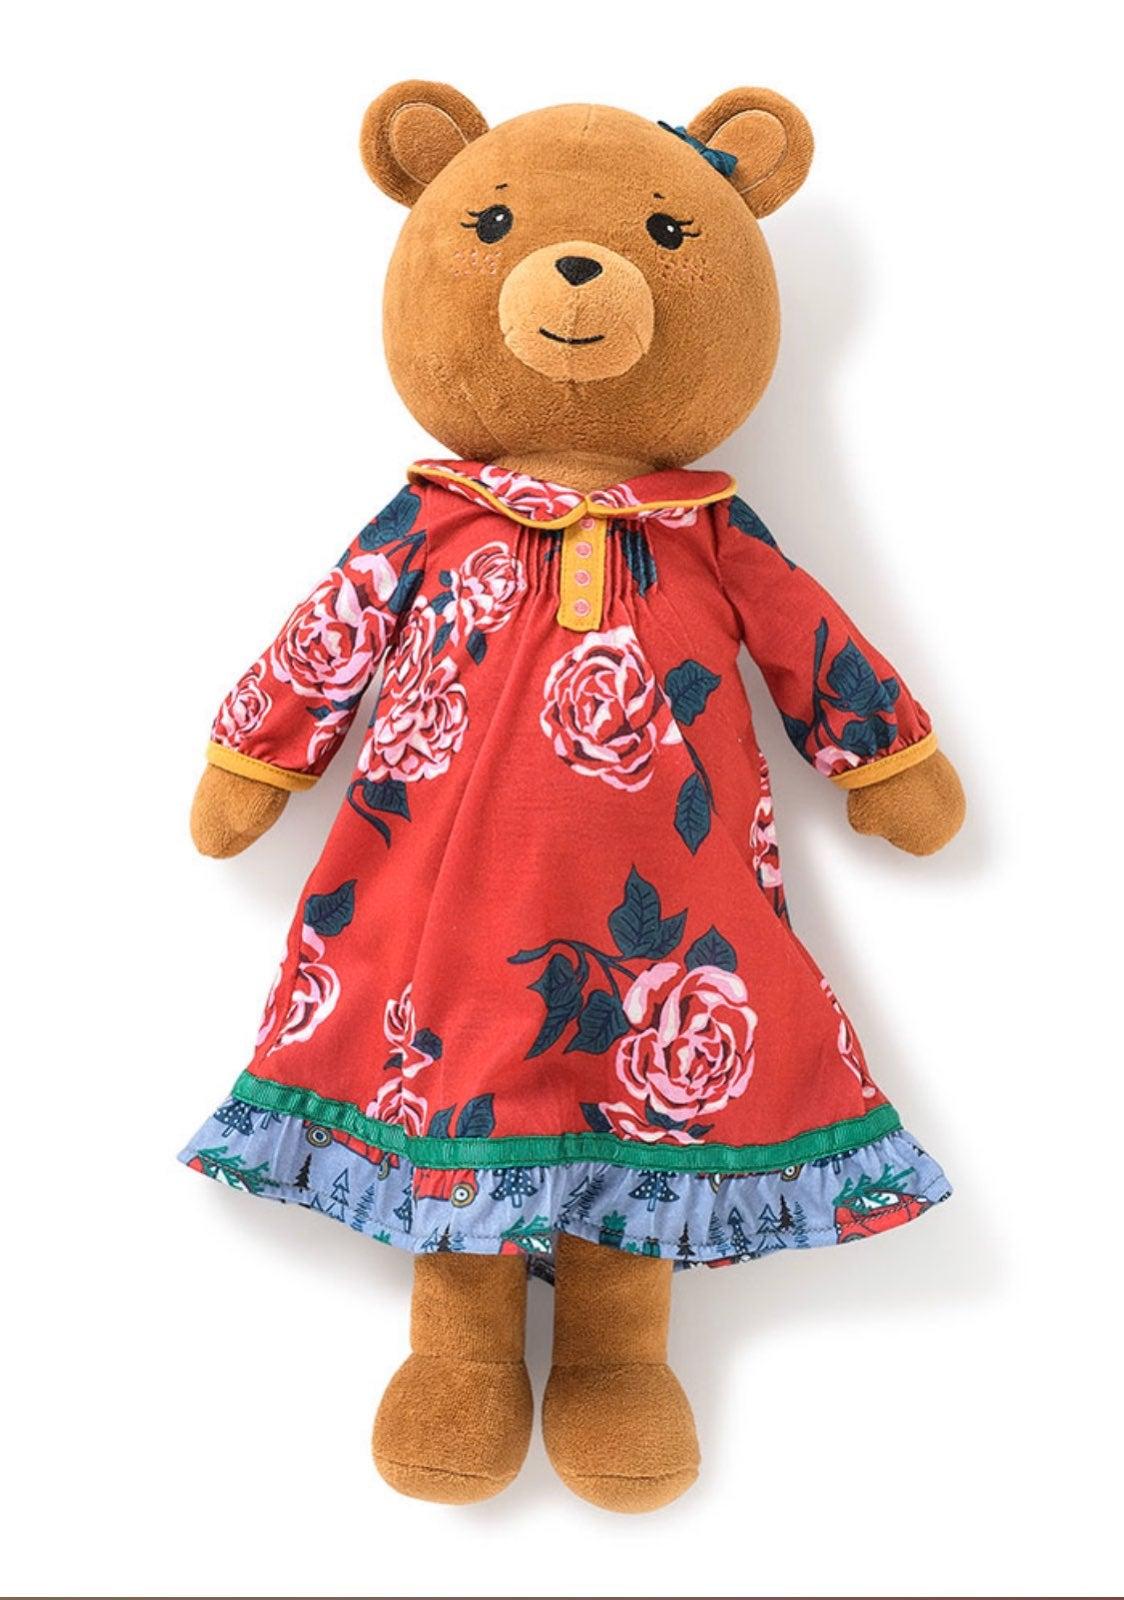 NWT Matilda Jane KIND BUNNY Stuffed Animal NEW IN BAG